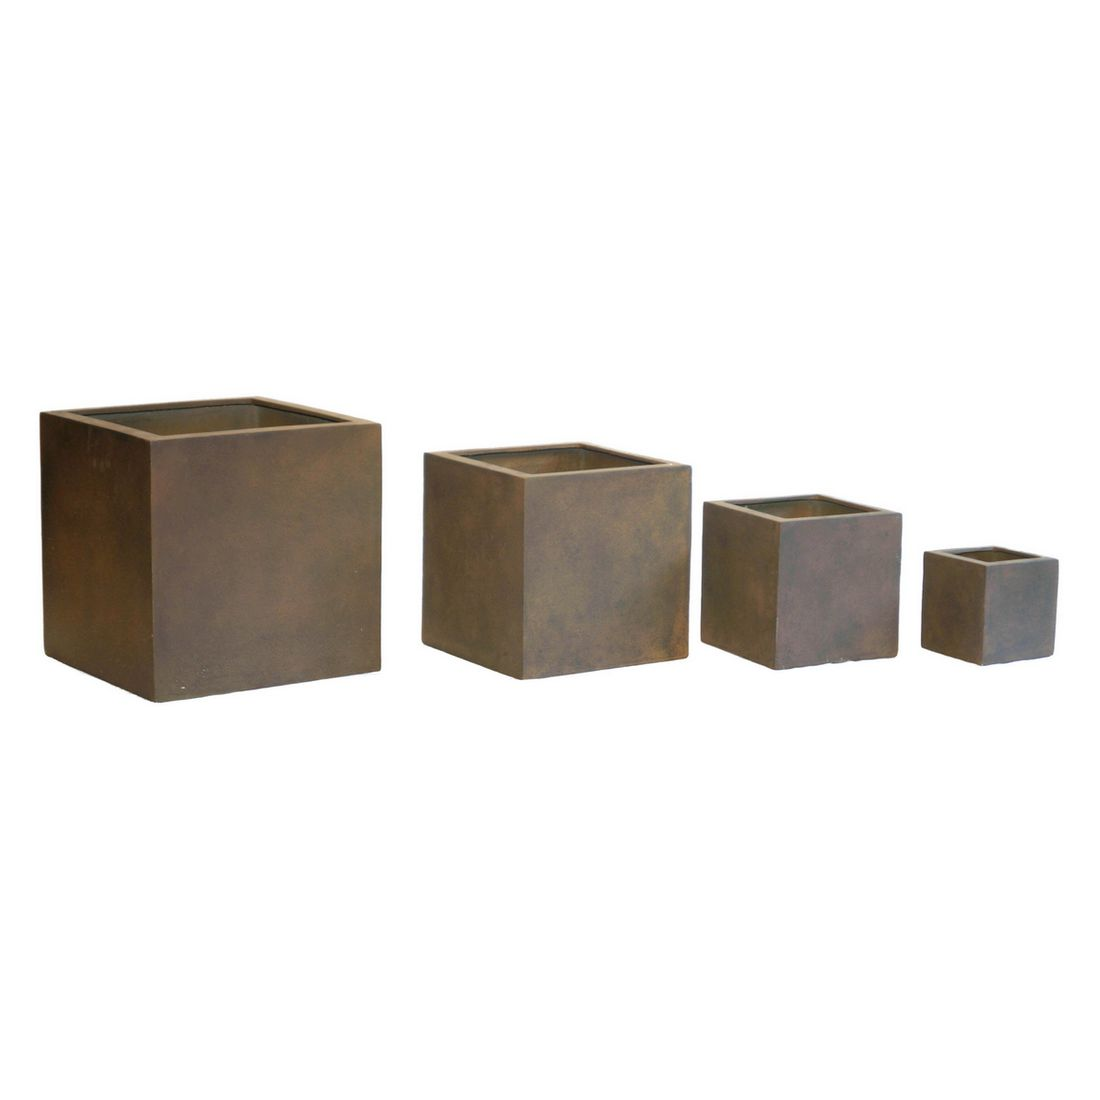 pflanzk bel rusty iron kunststoff modern eckig normal h he 50 cm breite 50 cm einzeln. Black Bedroom Furniture Sets. Home Design Ideas